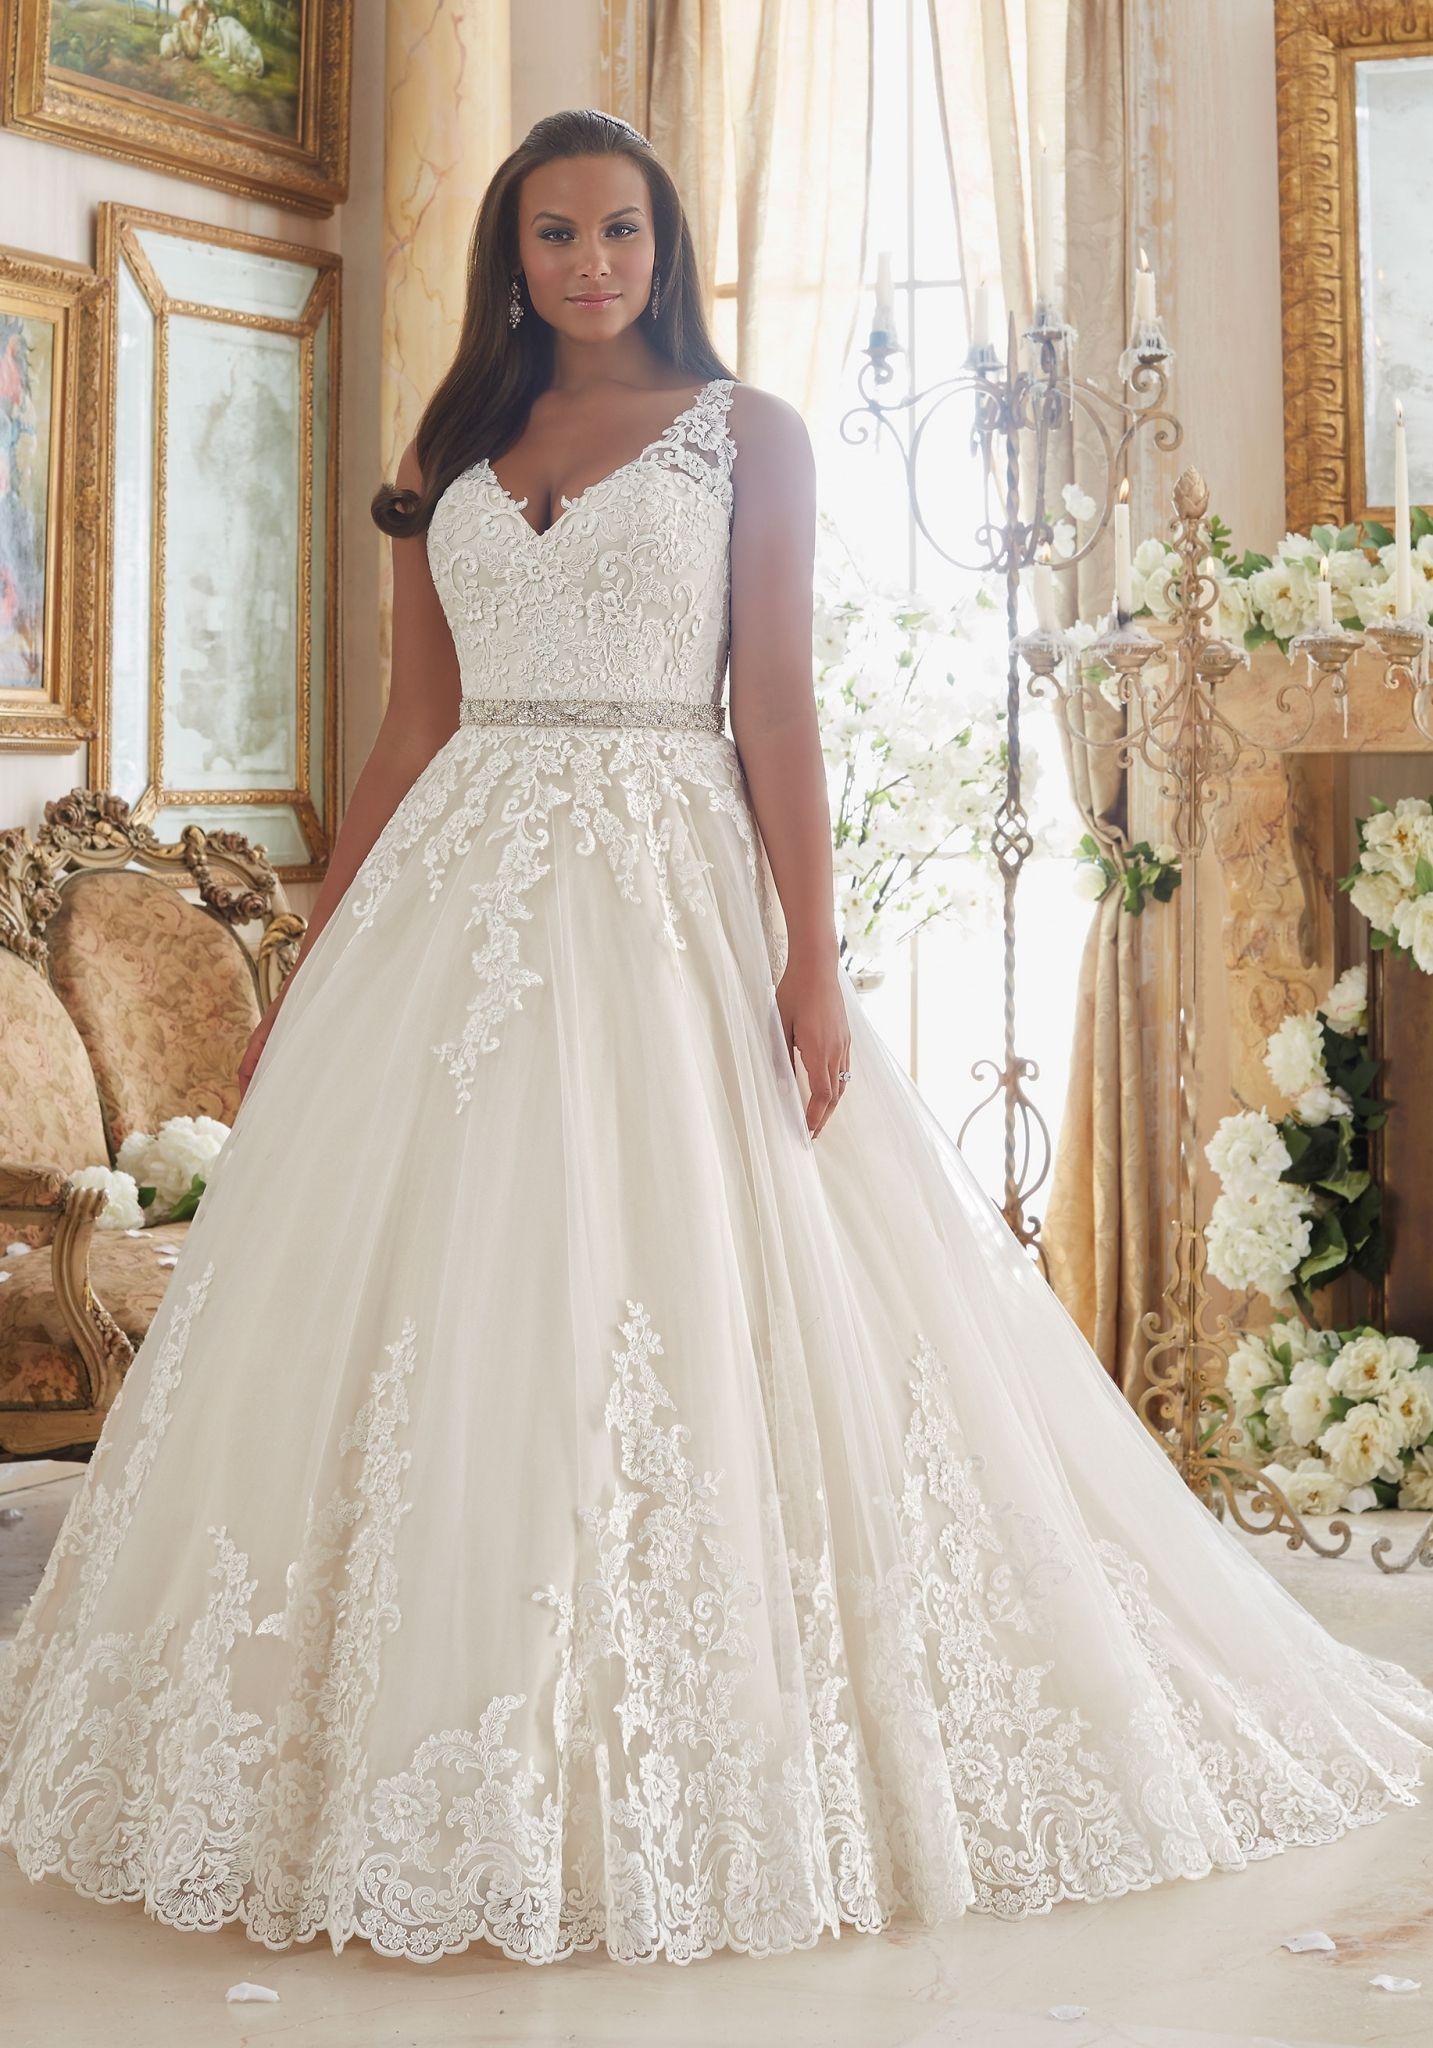 Plus size party dresses for weddings  plus size ball gown wedding dresses  womenus dresses for weddings